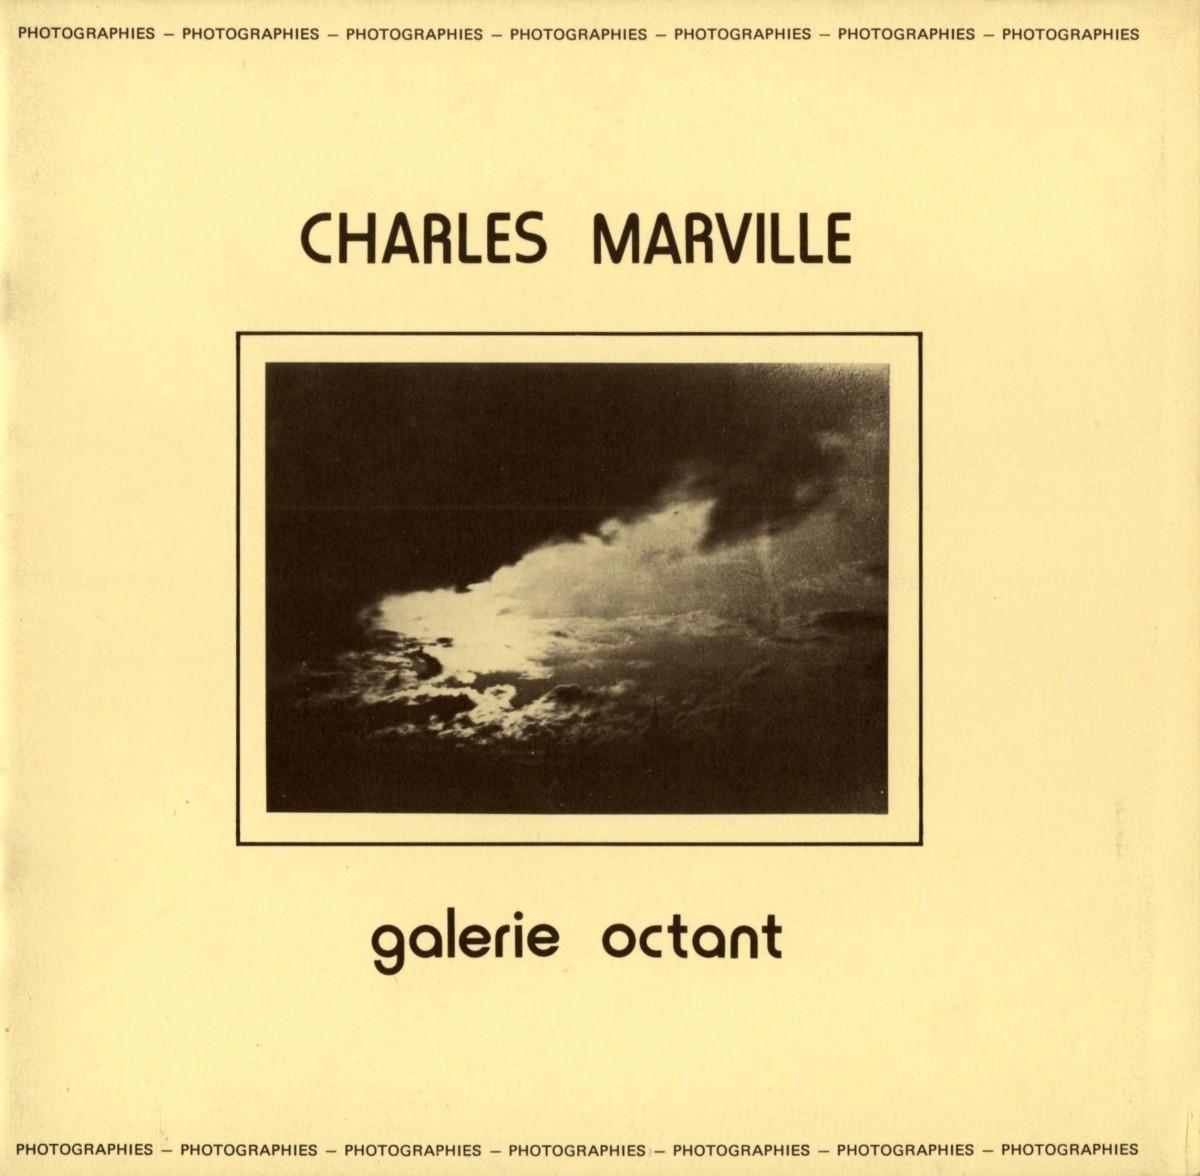 charles-marville_françoise-paviot